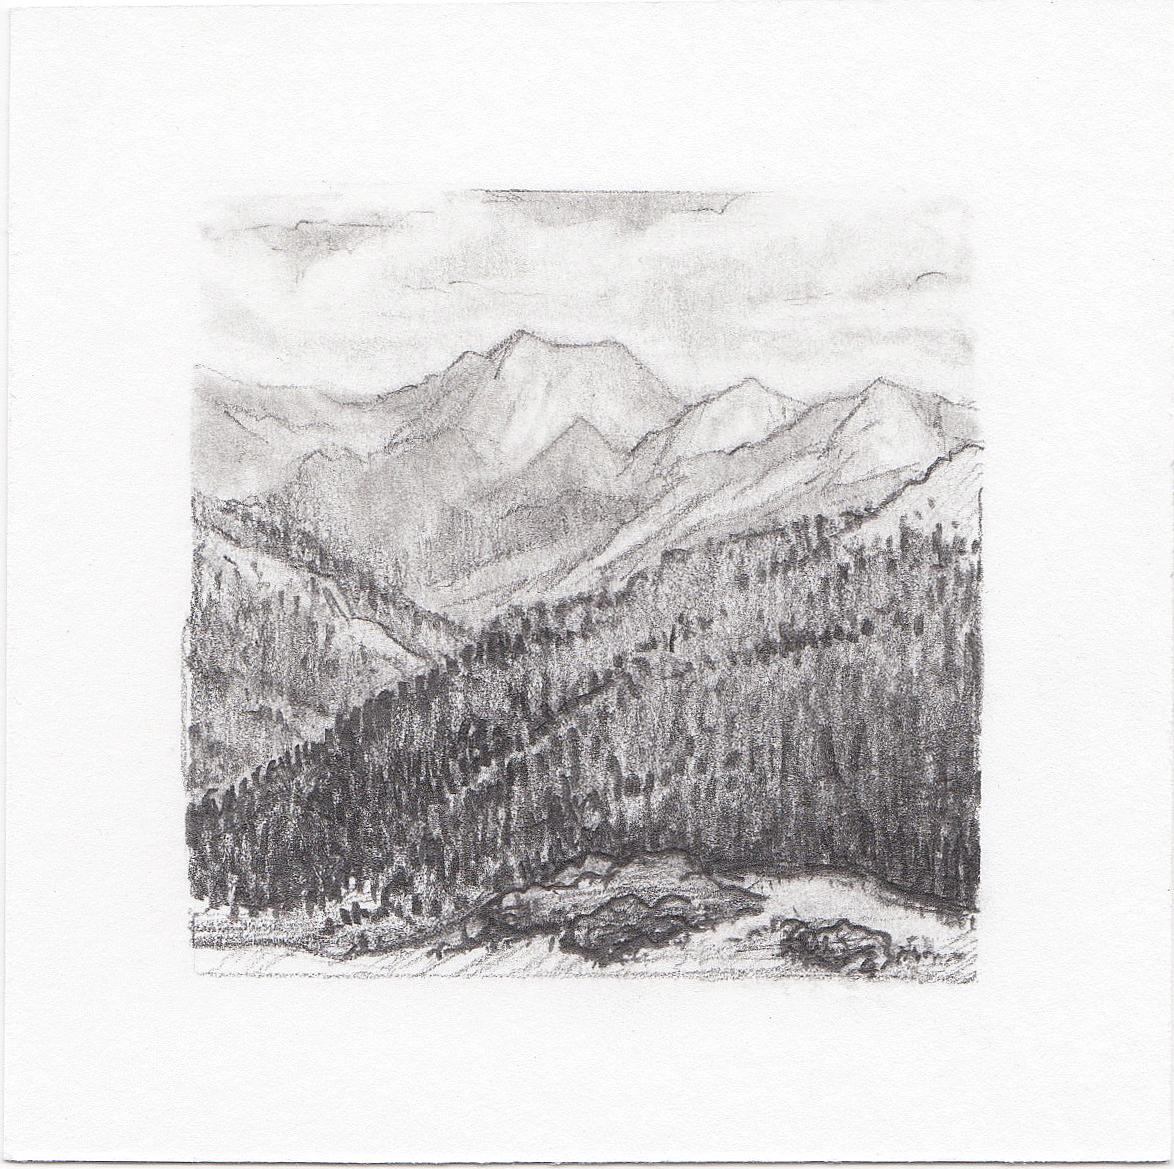 #48 Independence Pass, Colorado | 3x3 | graphite